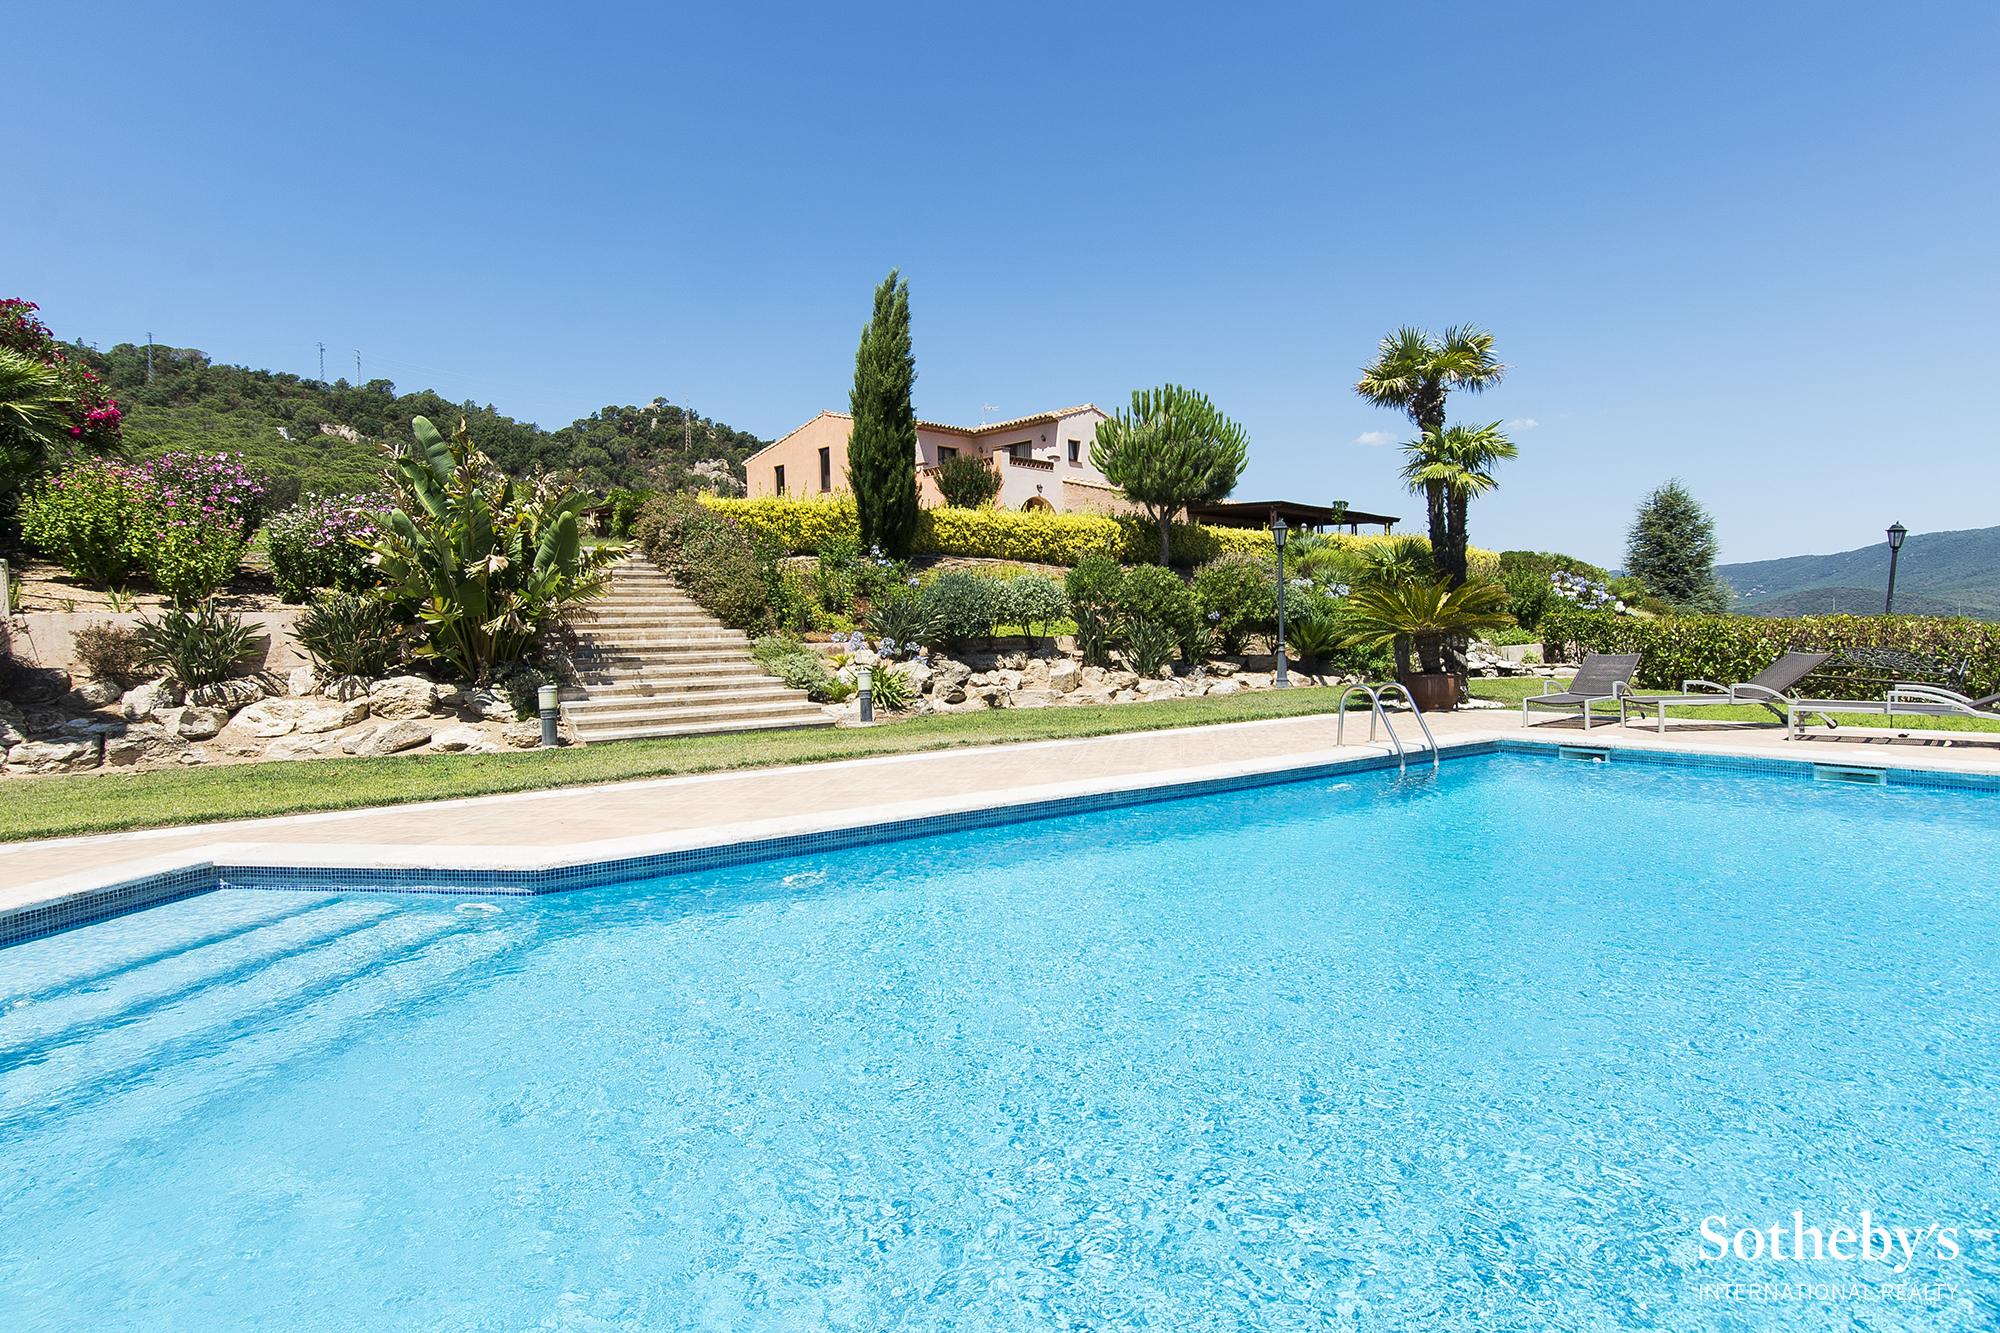 Single Family Home for Sale at Masia with amazing views Sant Feliu De Guixols, Costa Brava 17220 Spain